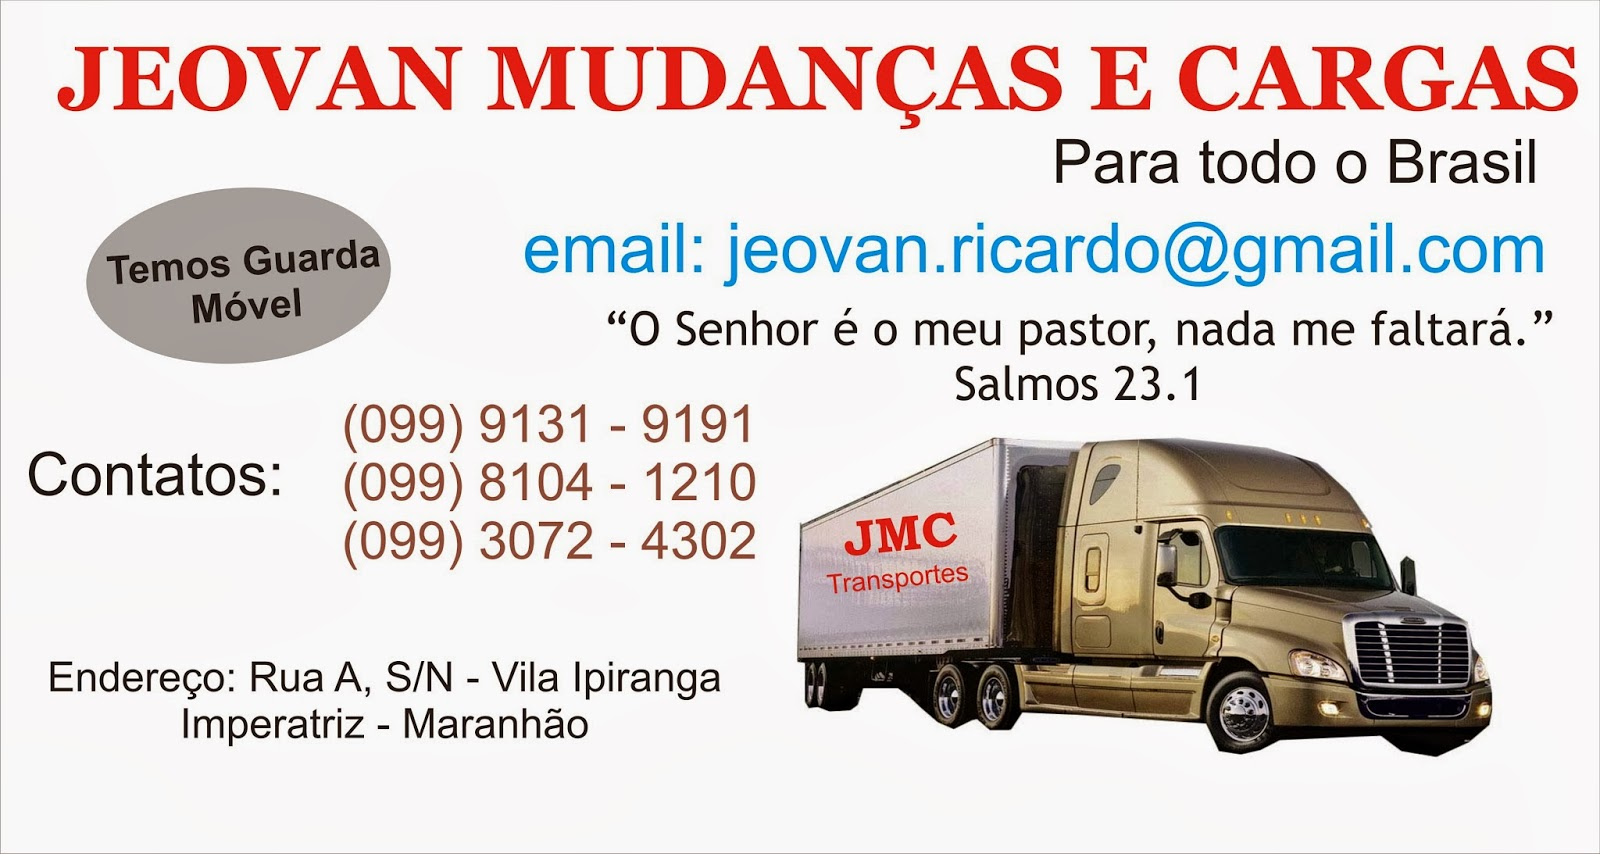 JMC Transportes